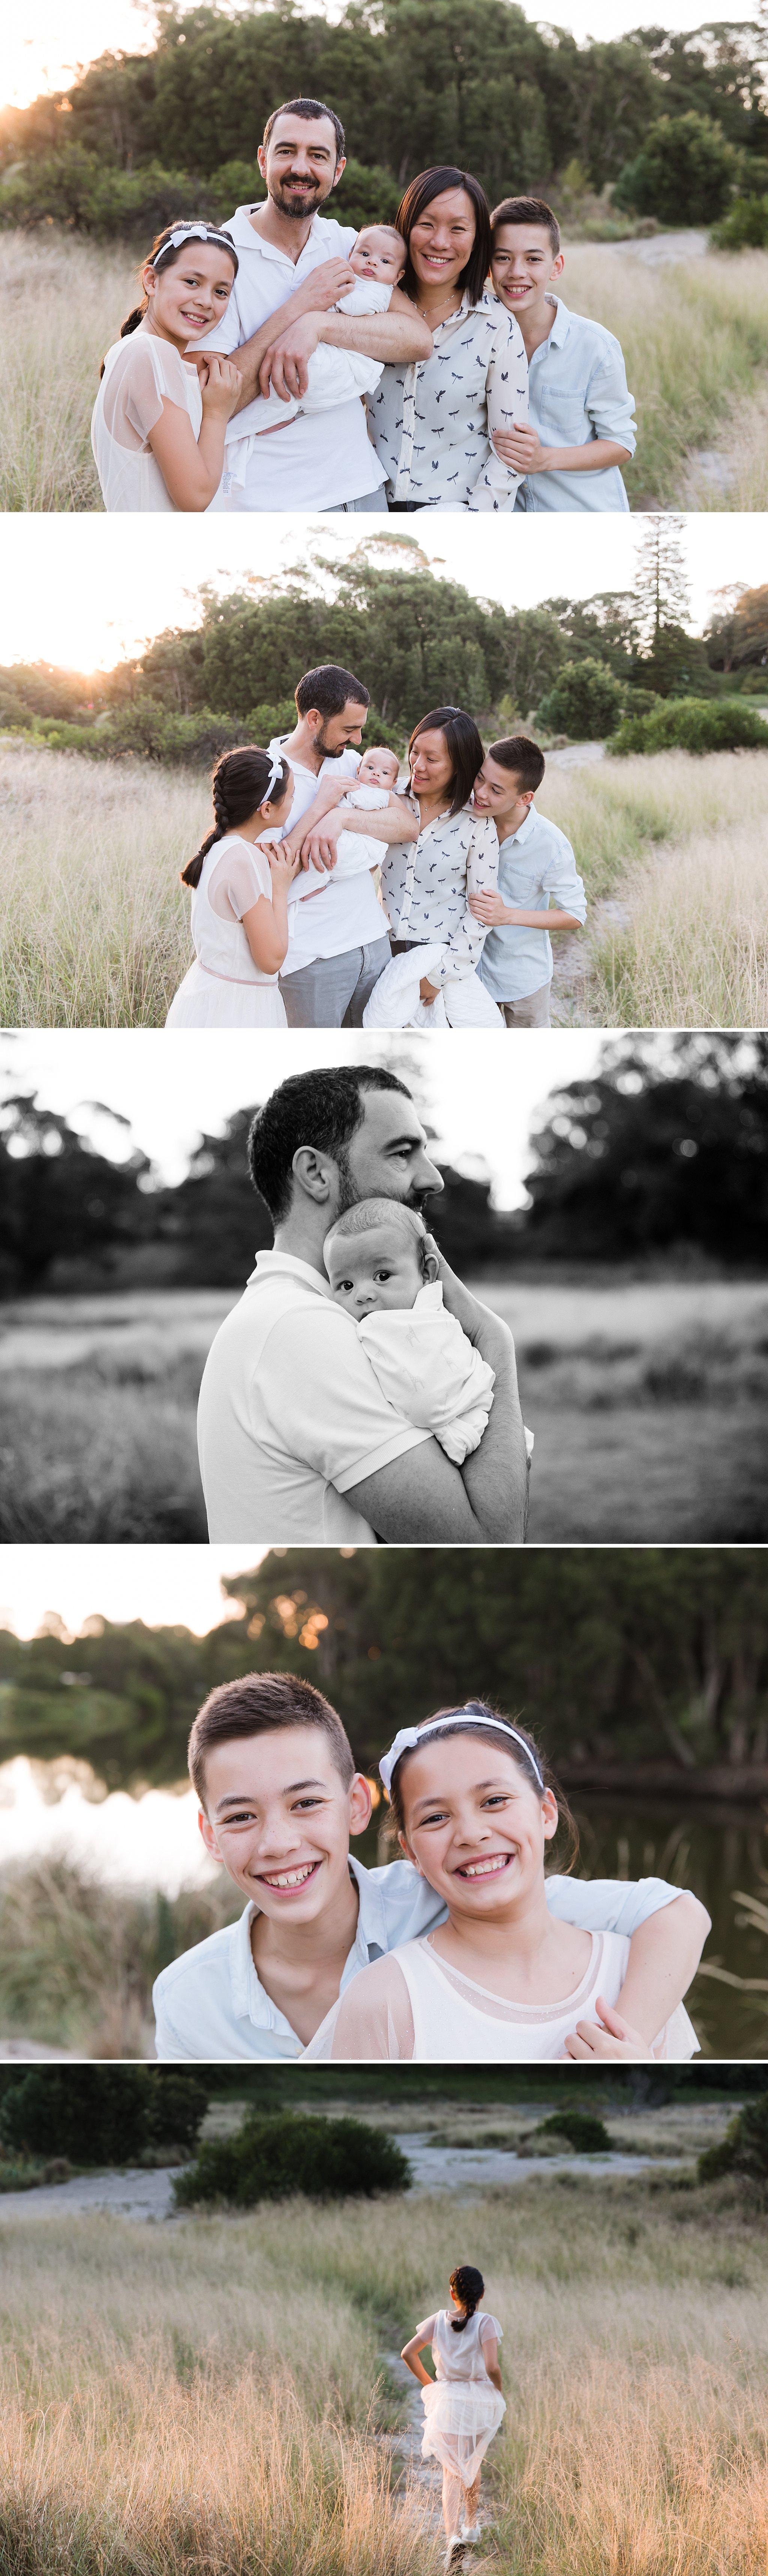 Sydney Lifestyle Family Photography_0006.jpg